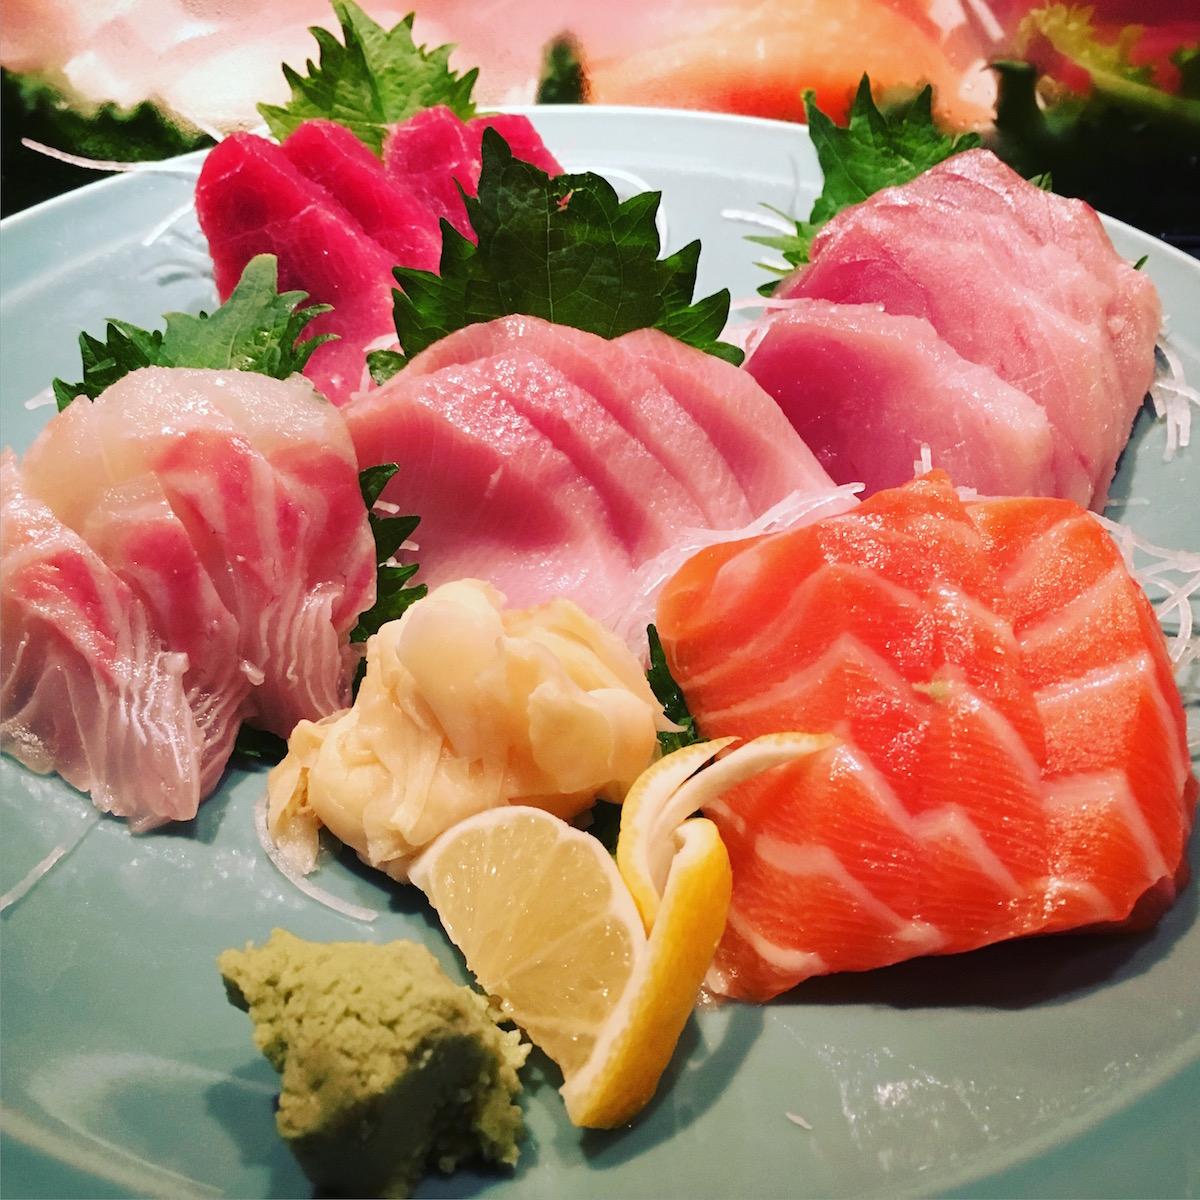 Toni's Sushi Bar - sashimi platter - maguro, hamachi, sake, cobia, kanpachi